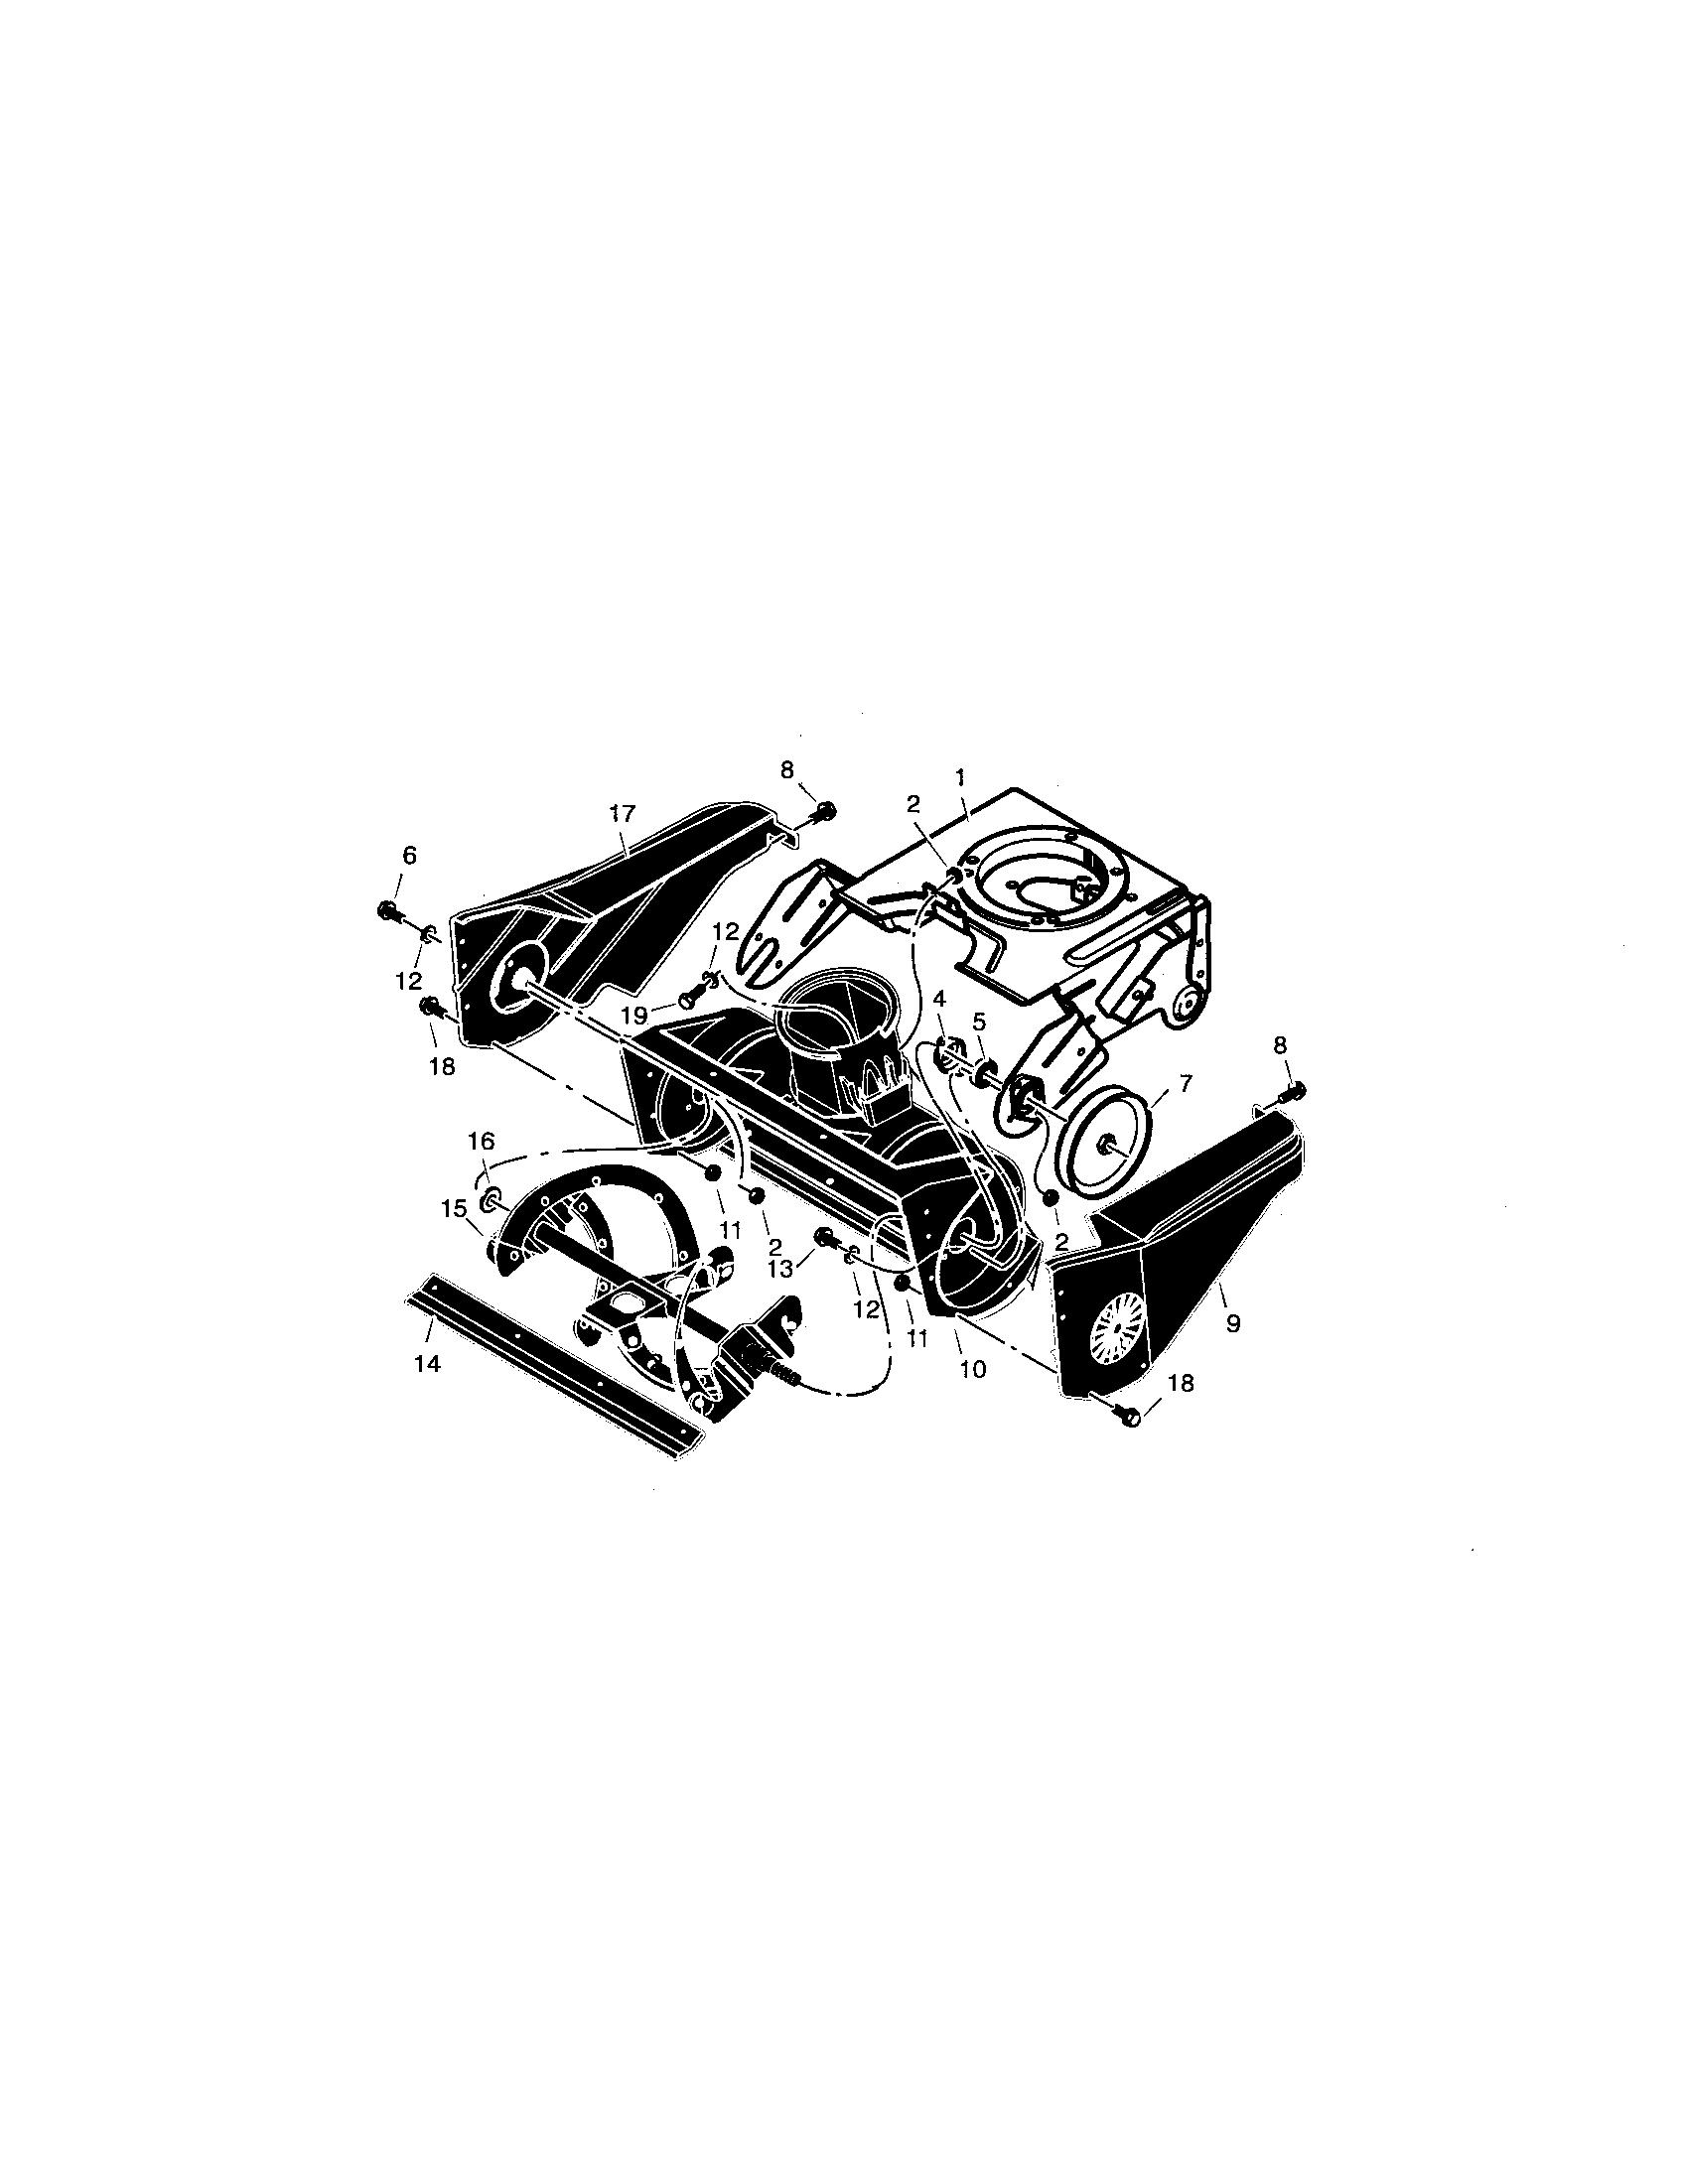 Craftsman model 536881400 snowthrower, gas genuine parts